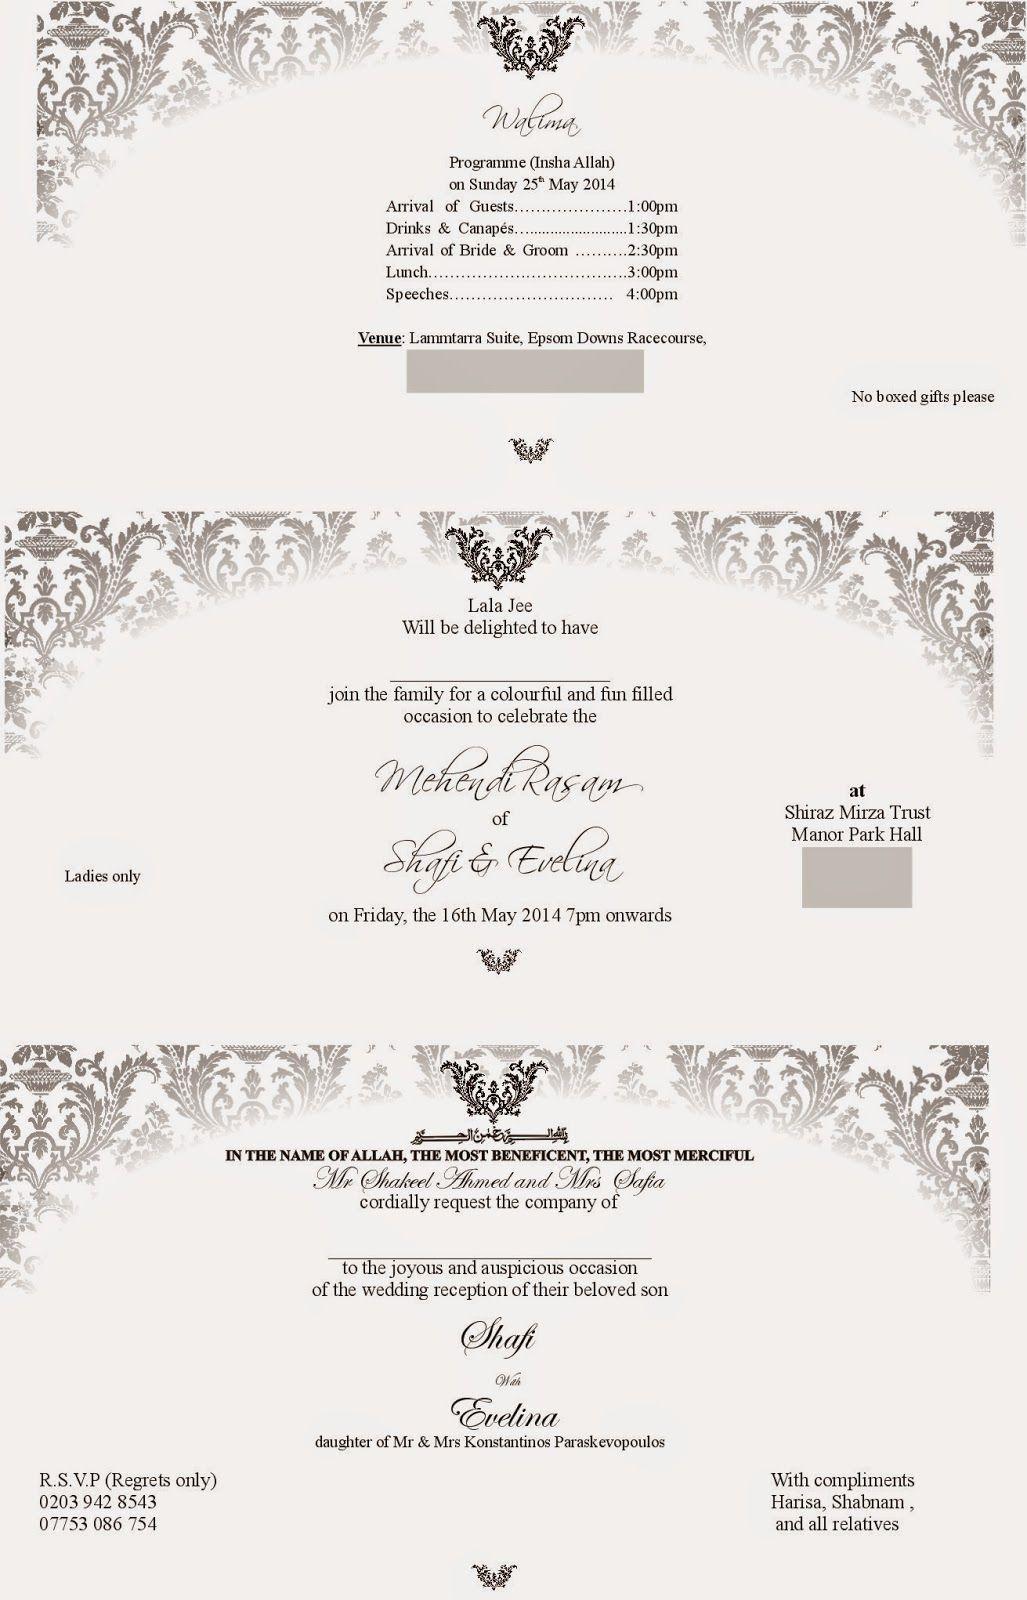 Pin By Wallmedia On Cards Ideas In 2020 Marriage Invitation Card Invitation Card Sample Marriage Invitations